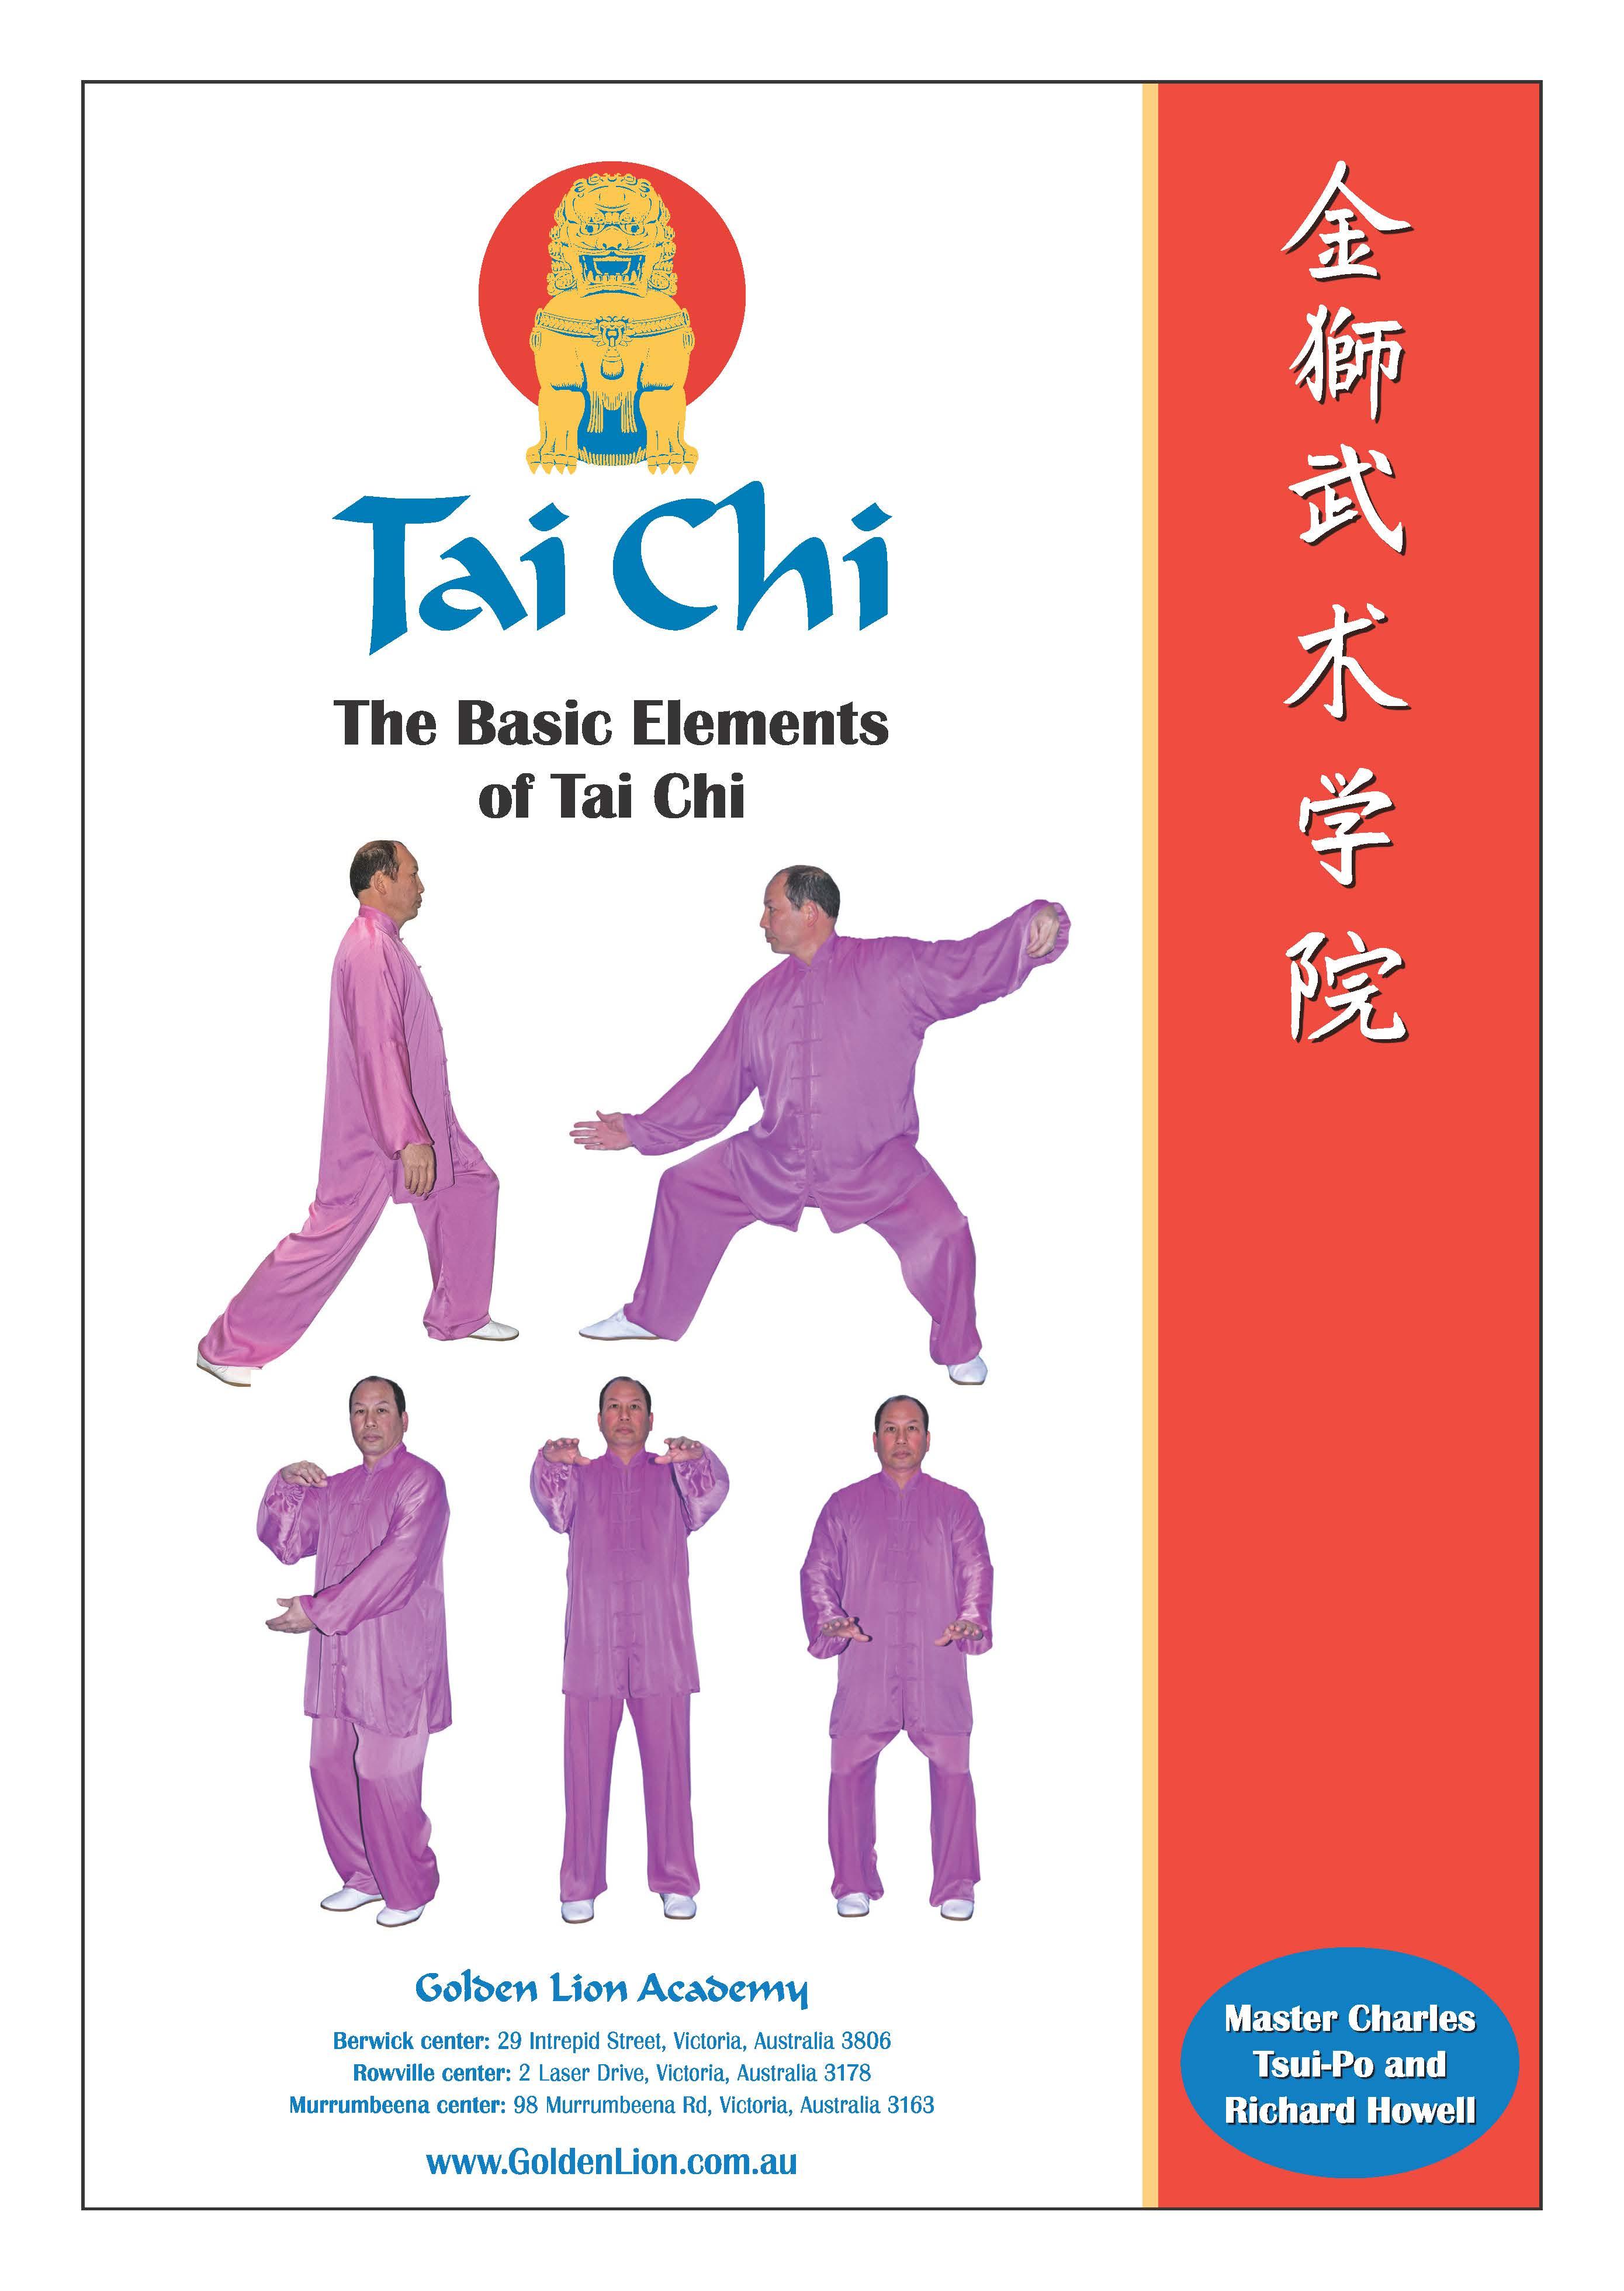 The Basic Elements of Tai Chi Instructional Manual